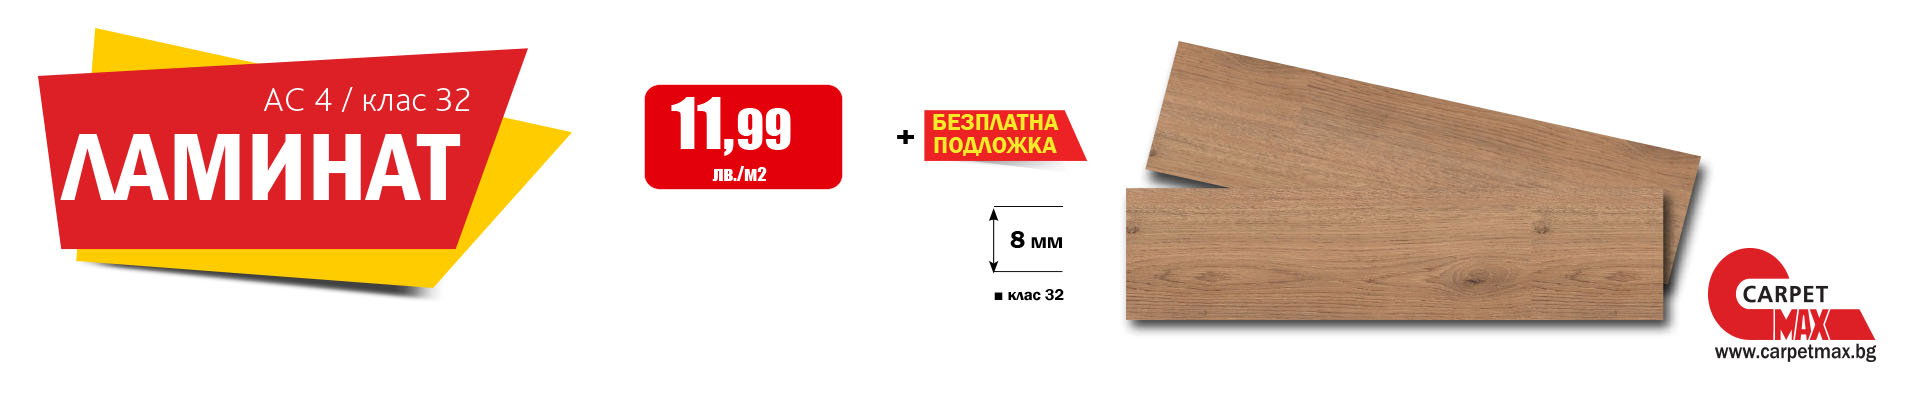 Ламинат 11.99